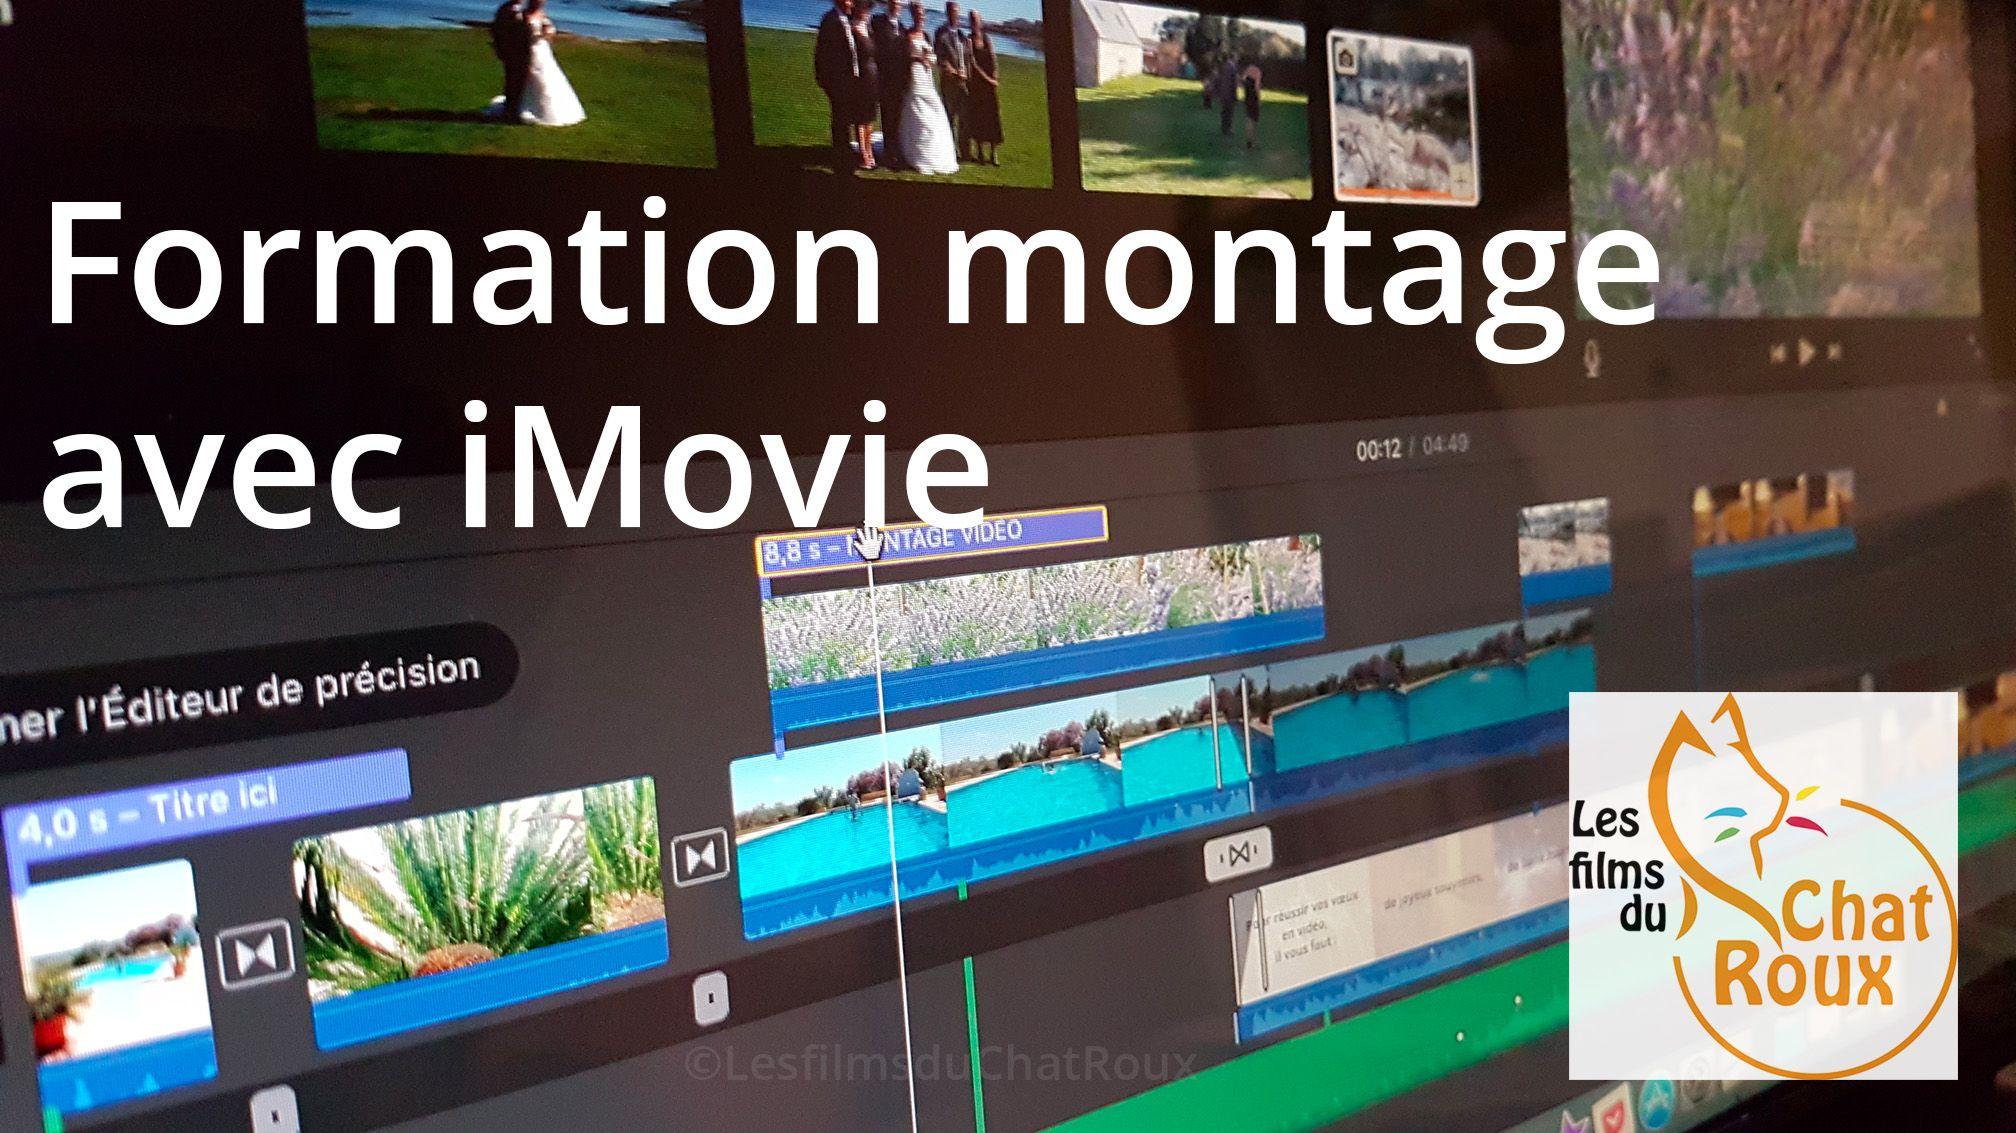 Formation montage avec iMovie